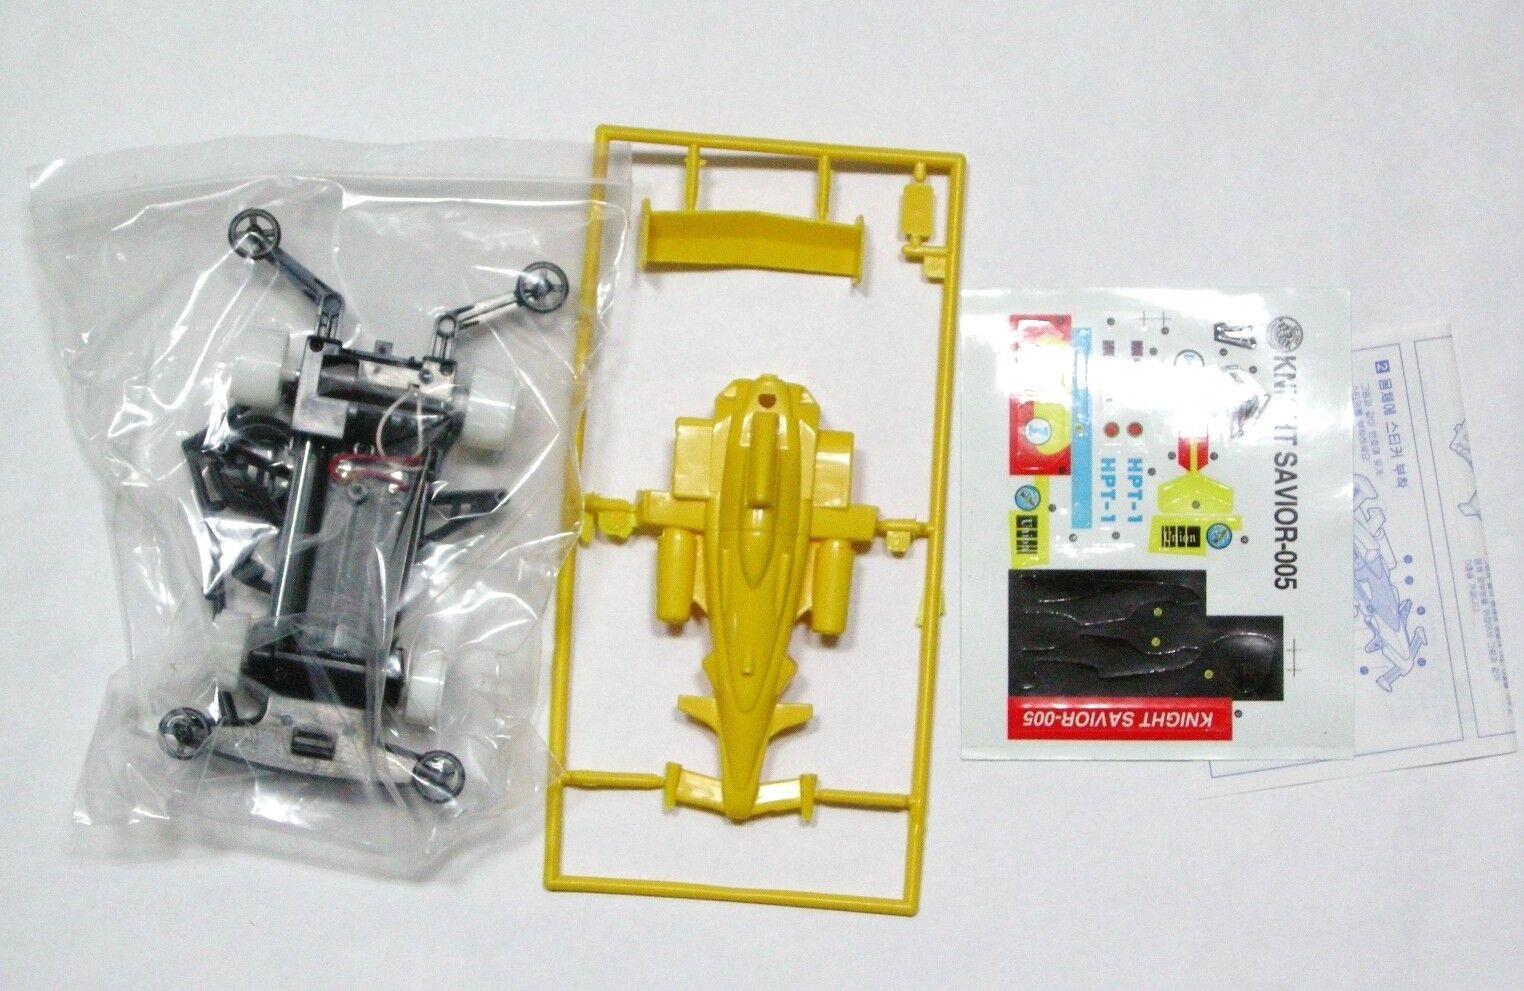 Future GPX Cyber Formula   KNIGHT KNIGHT KNIGHT SAVIOR 4WD 1 32 Assembled Car Rare(Korea Ver.) 9feaae